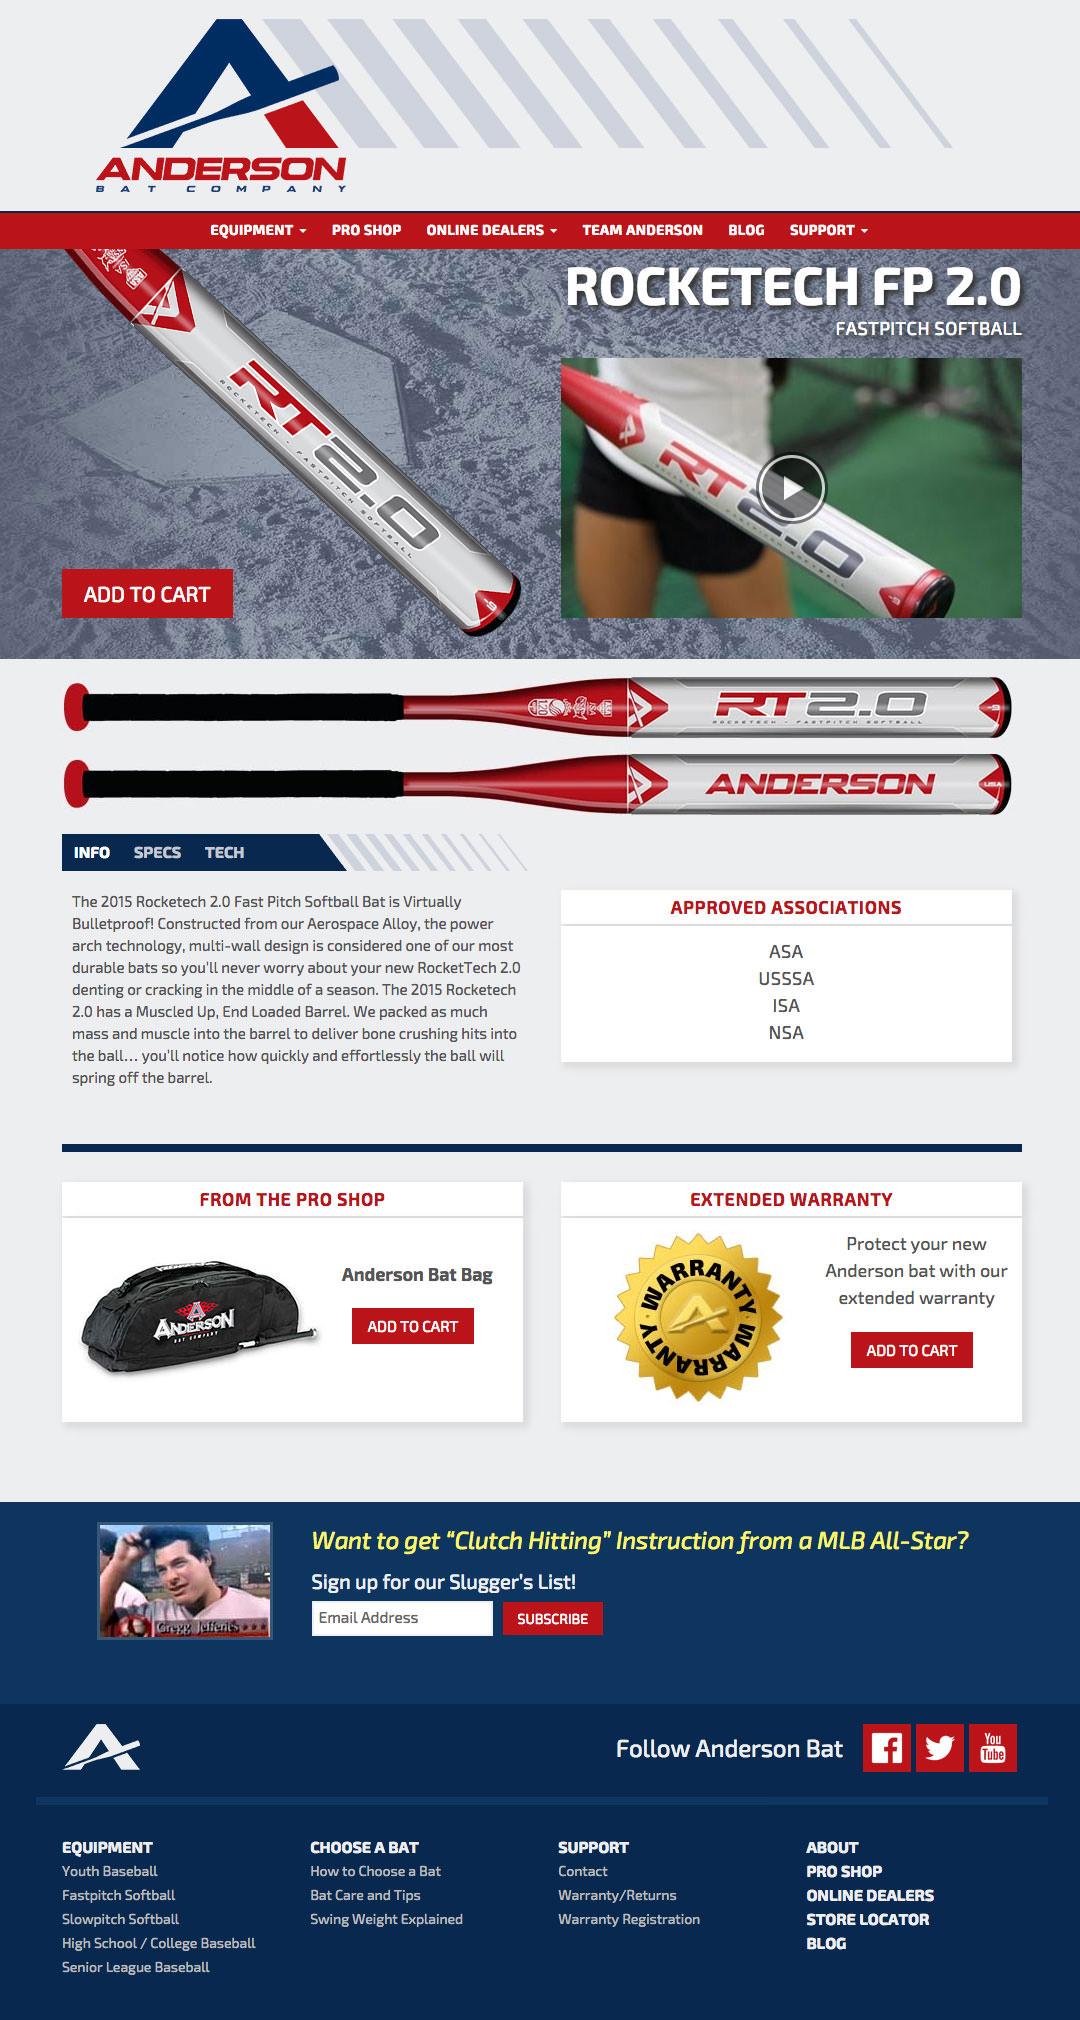 Anderson Bat Website - RockeTech FP